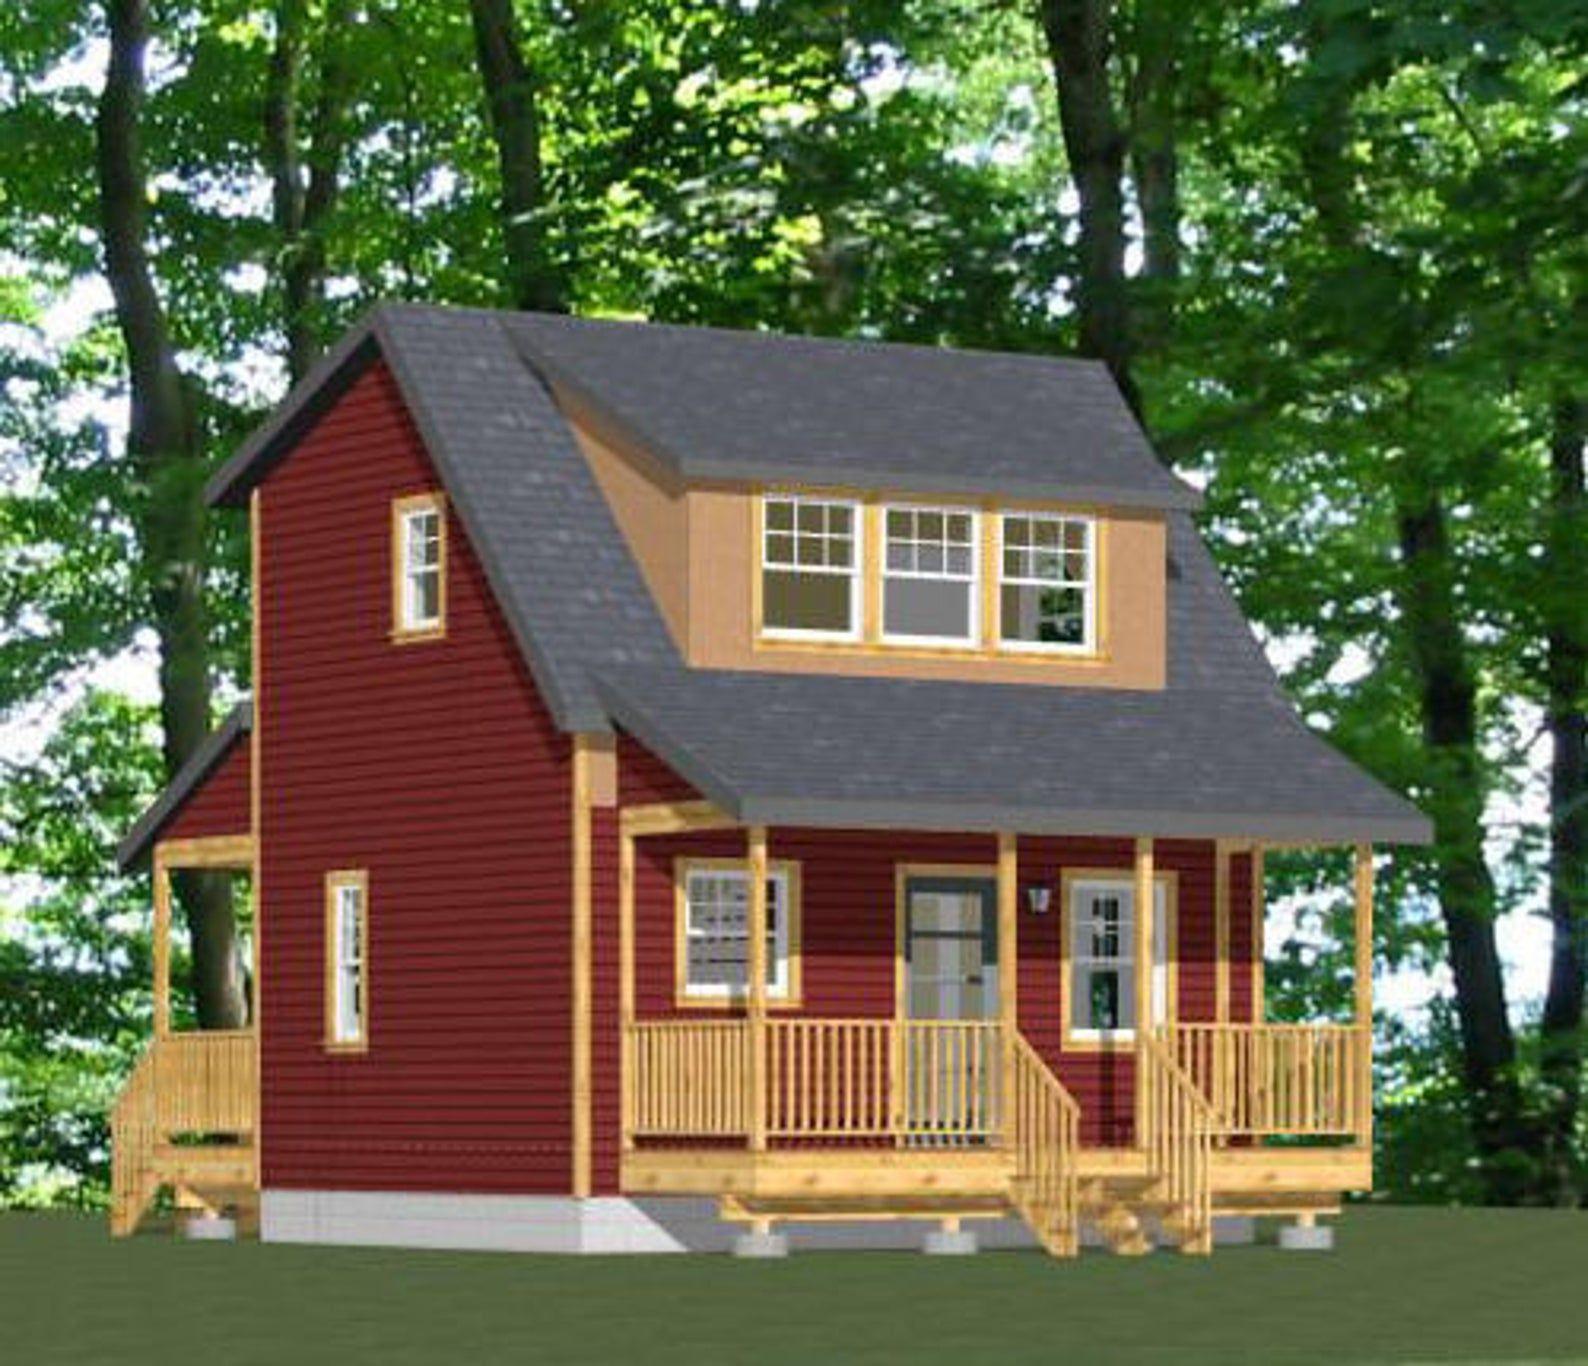 20x16 House 1Bedroom 1.5Bath 557 sq ft PDF Floor Etsy